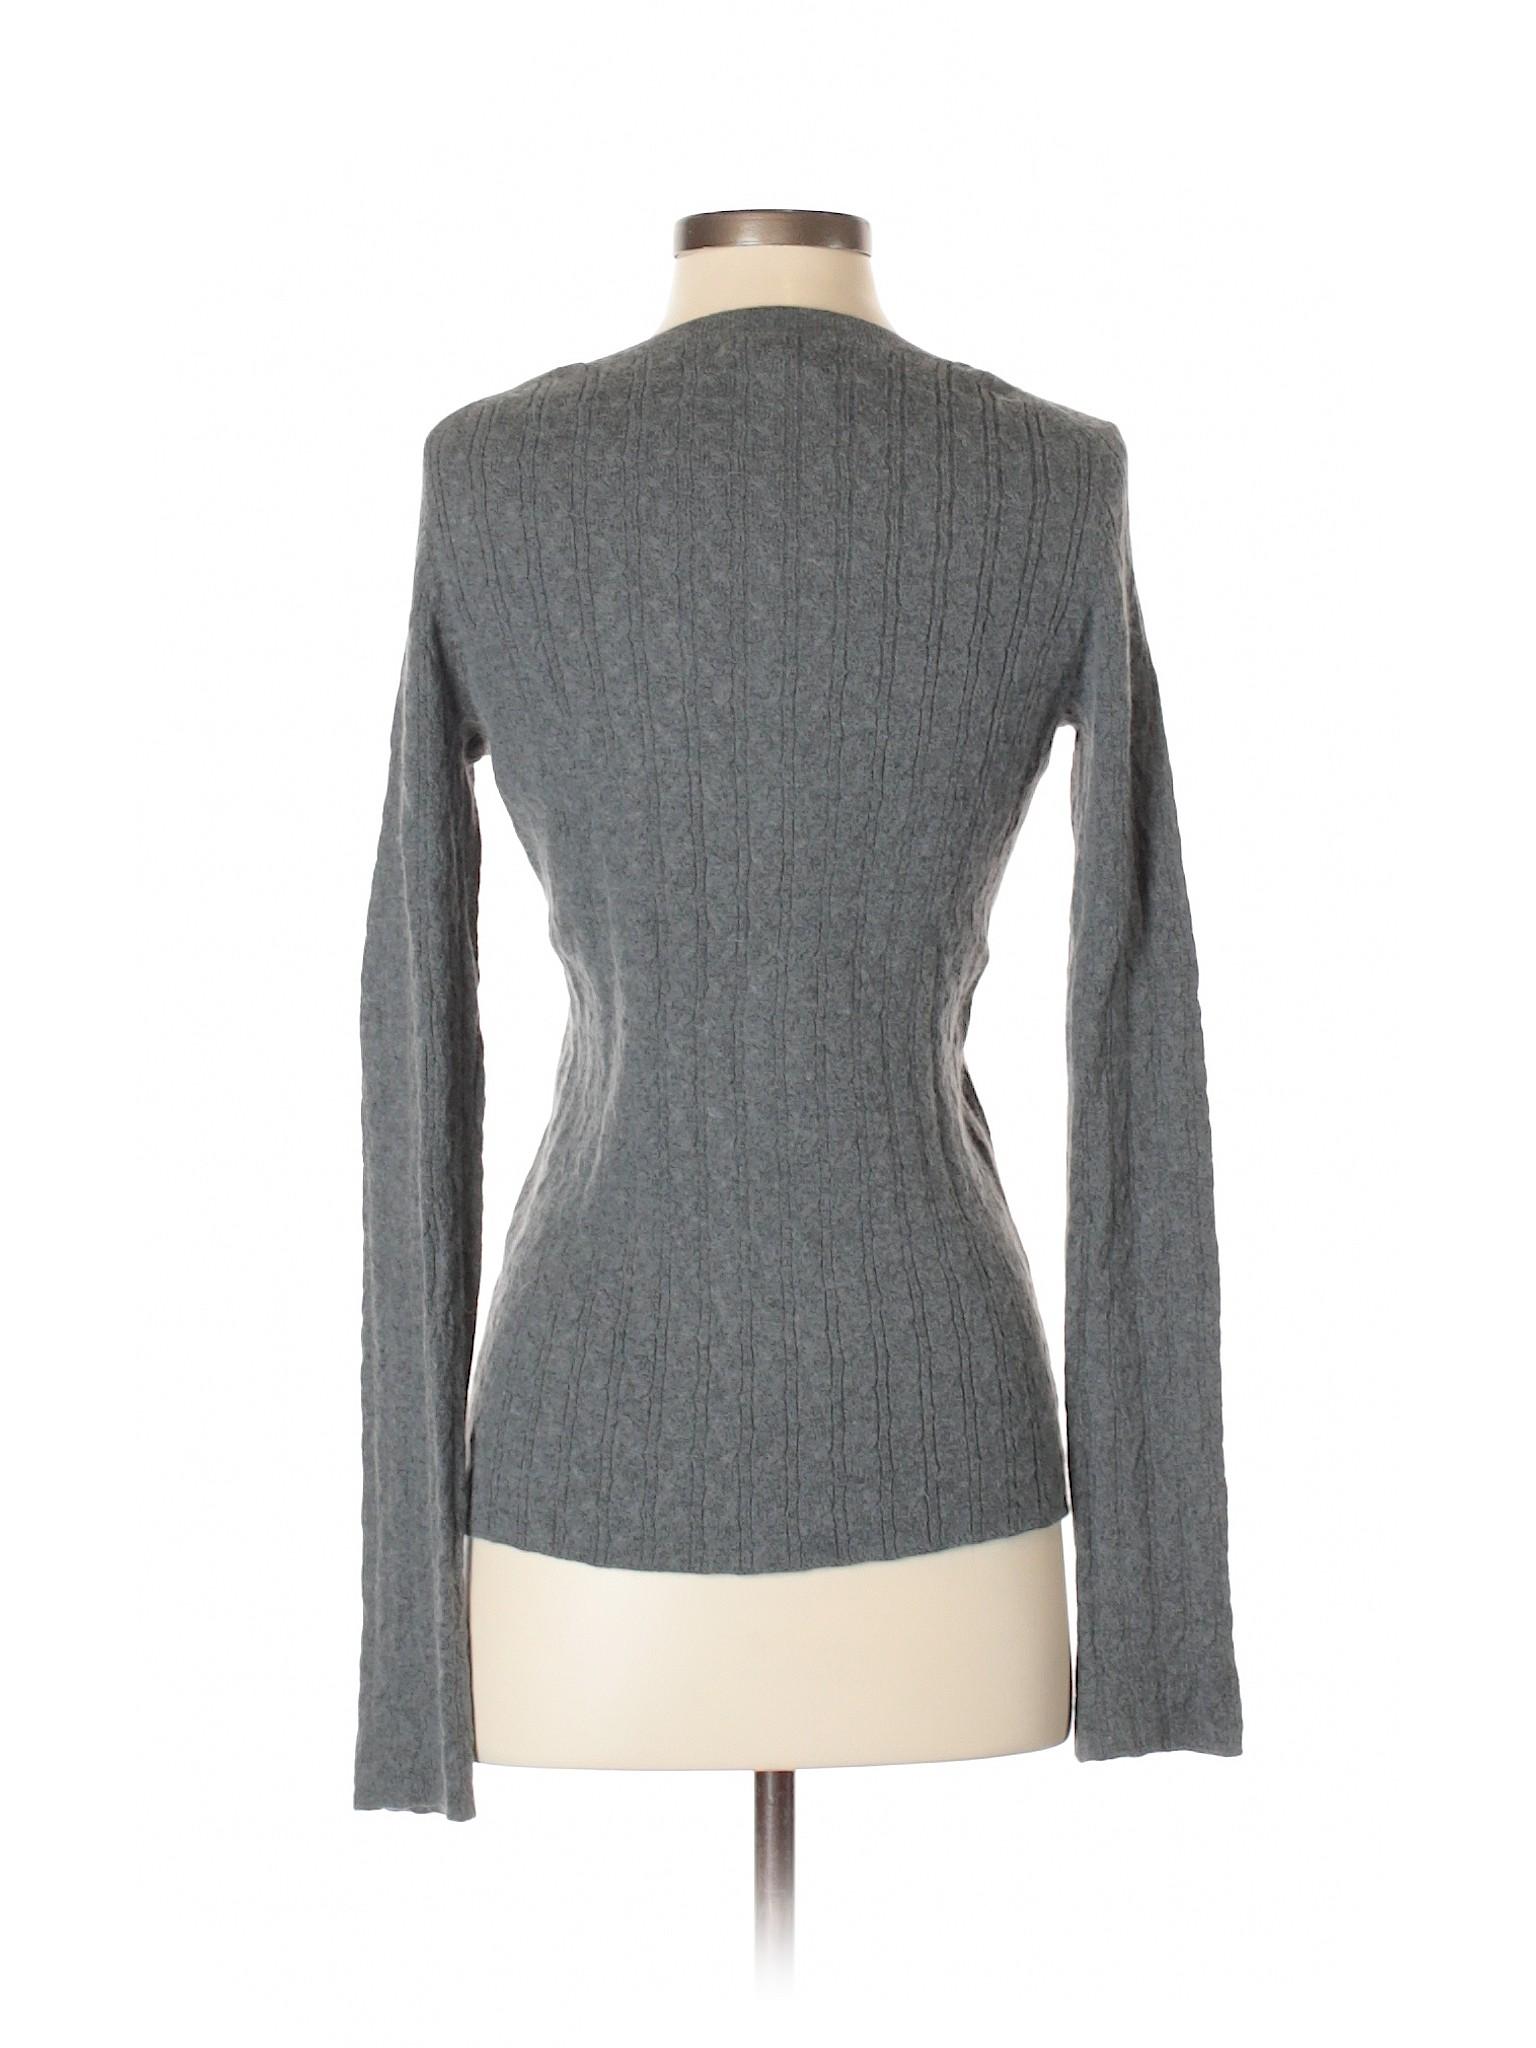 Banana Factory Store Sweater Pullover winter Boutique Republic Htw55R